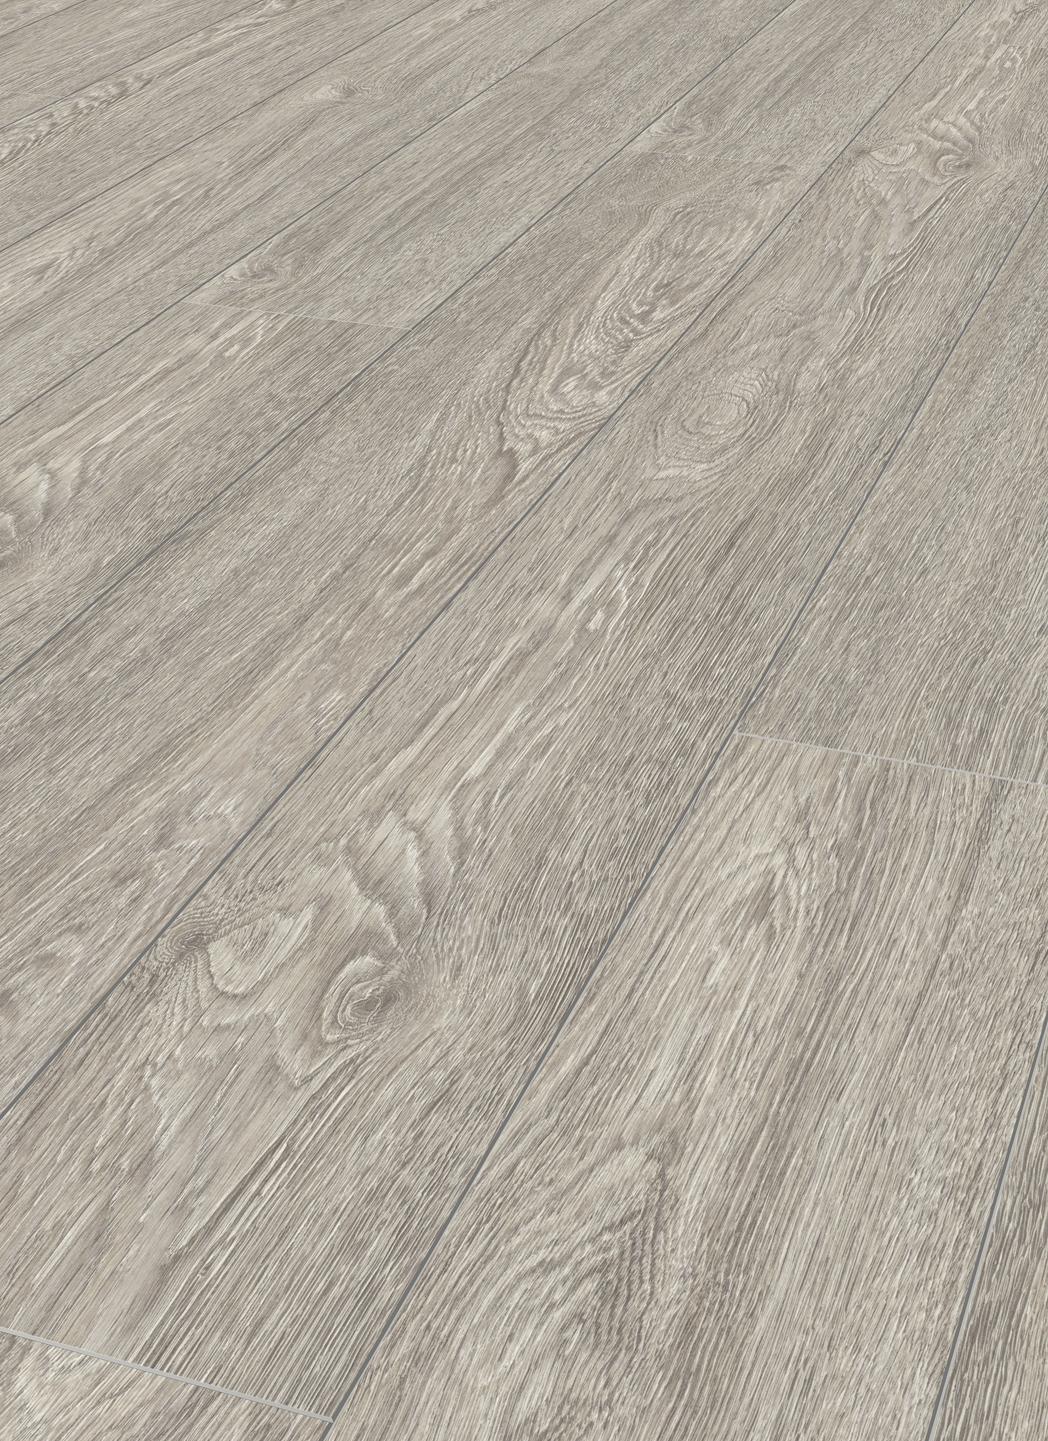 Laminate long boards oak slate grey london distributors for Laminate flooring london